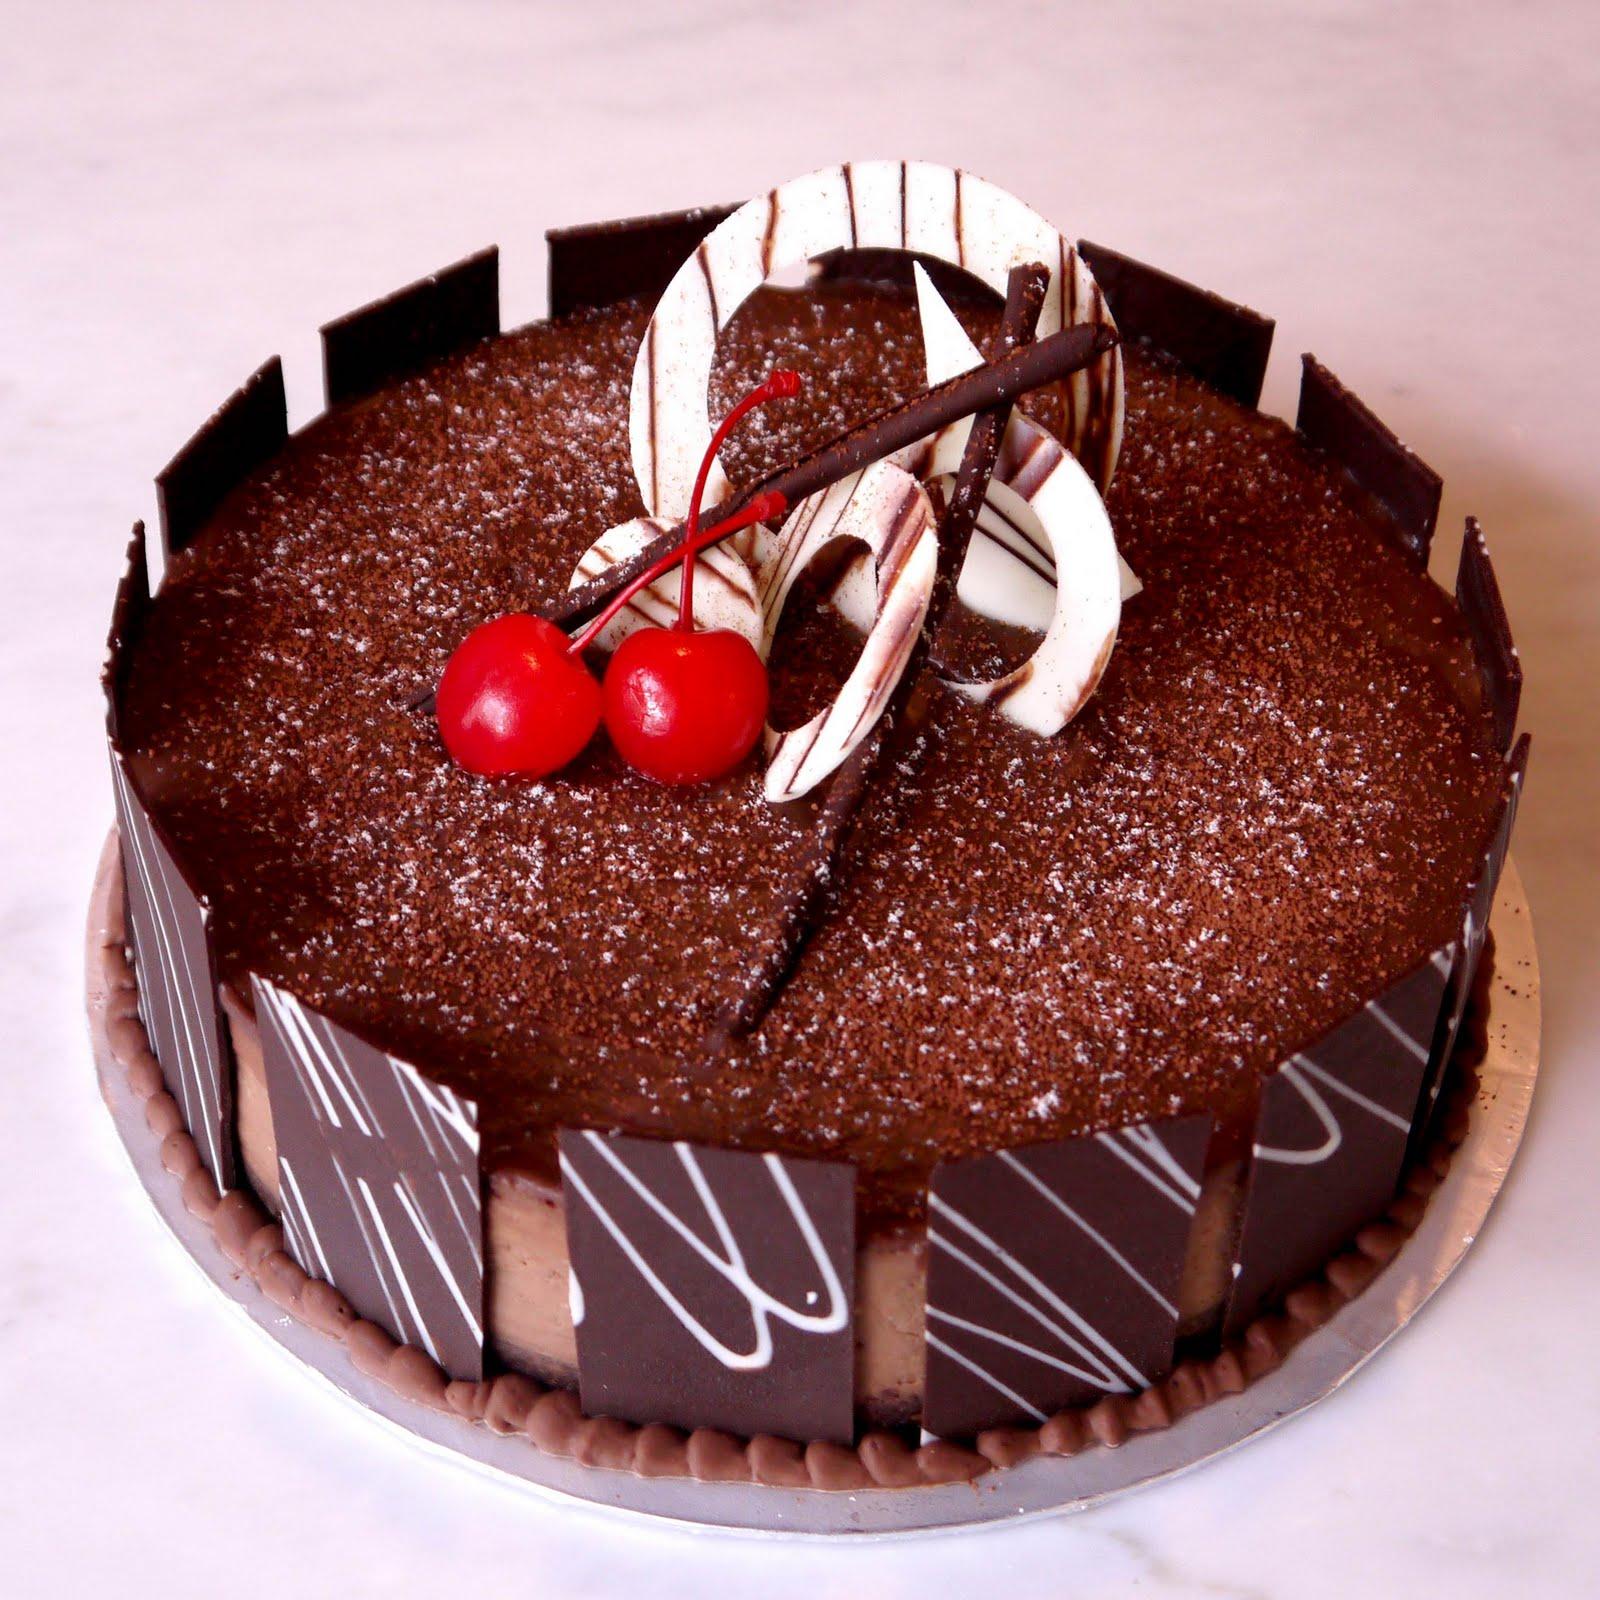 11 Cakes Beautiful Chocolate Decoration Photo Chocolate Birthday